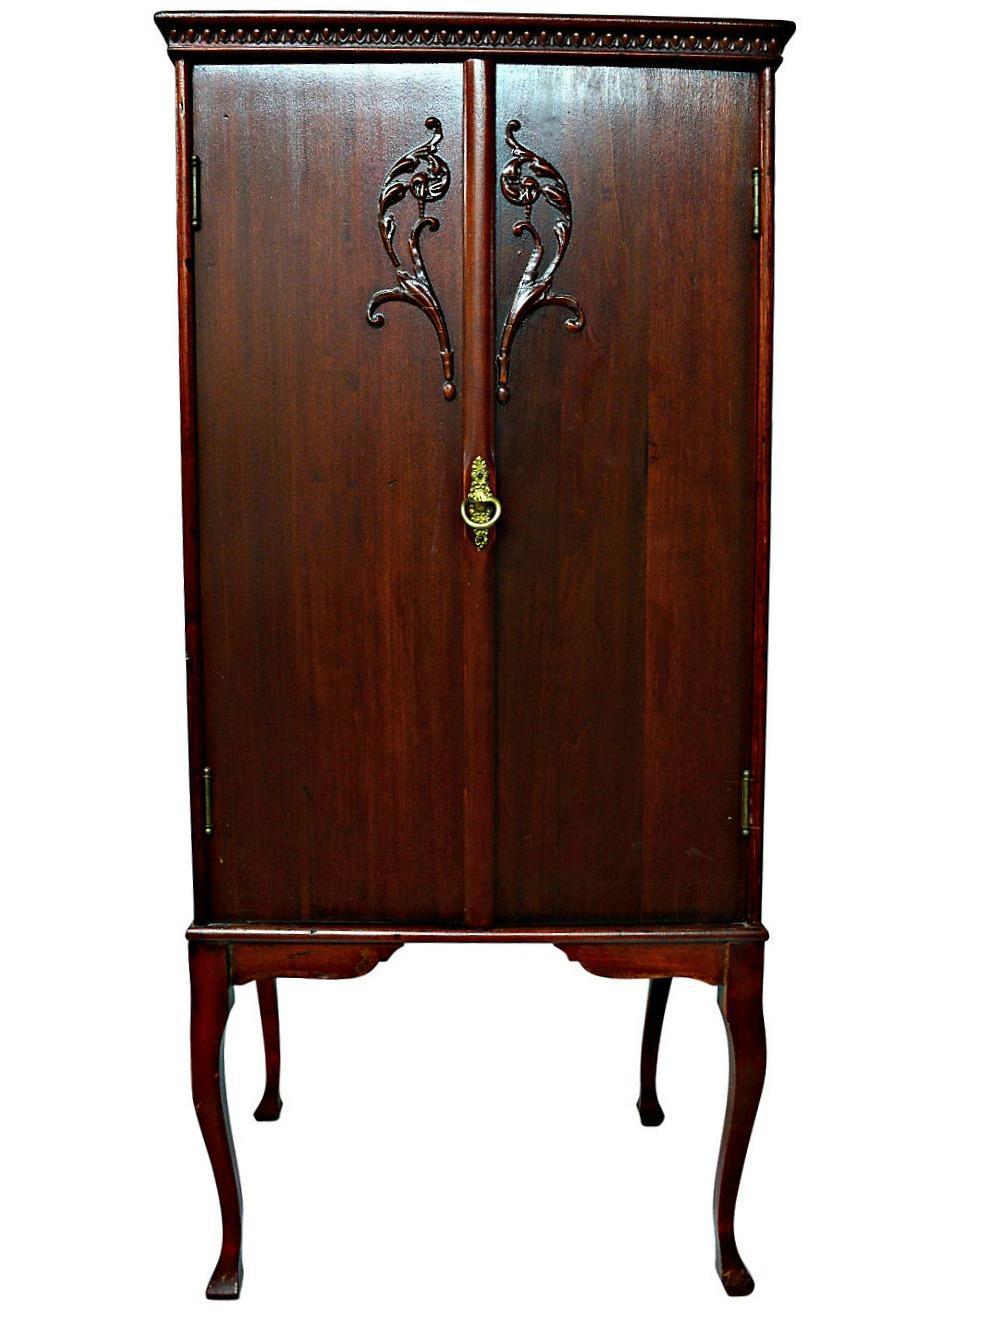 Antique Sheet Music Cabinet Chairish